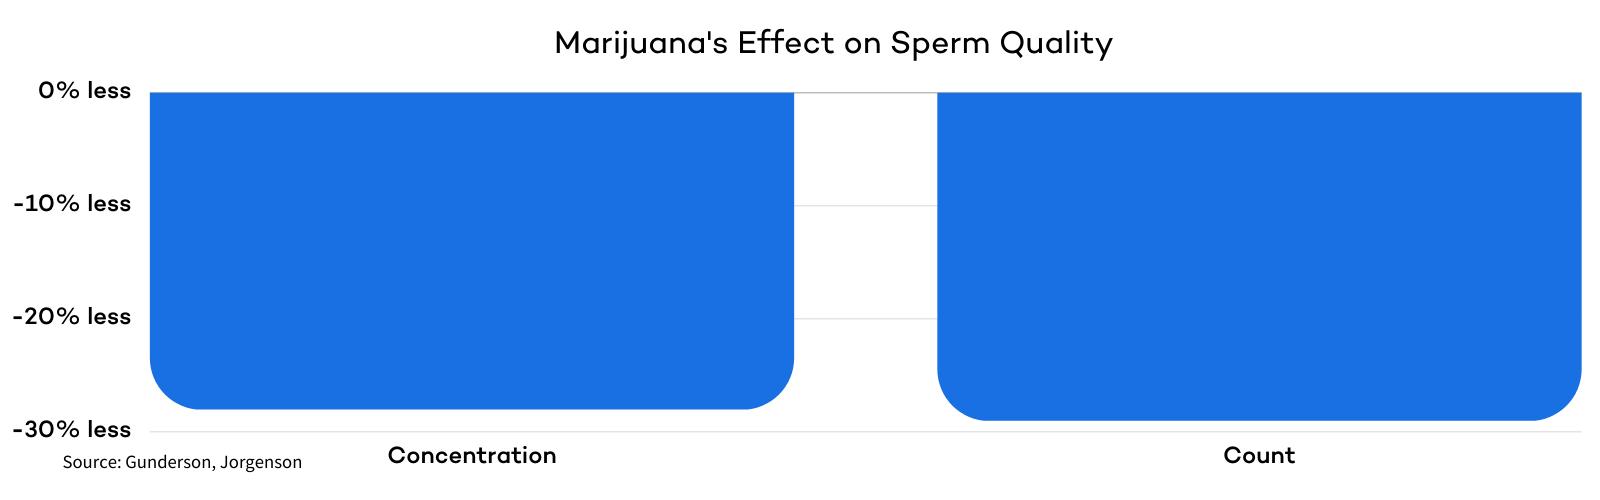 Marijuan's Affect on Sperm Quality